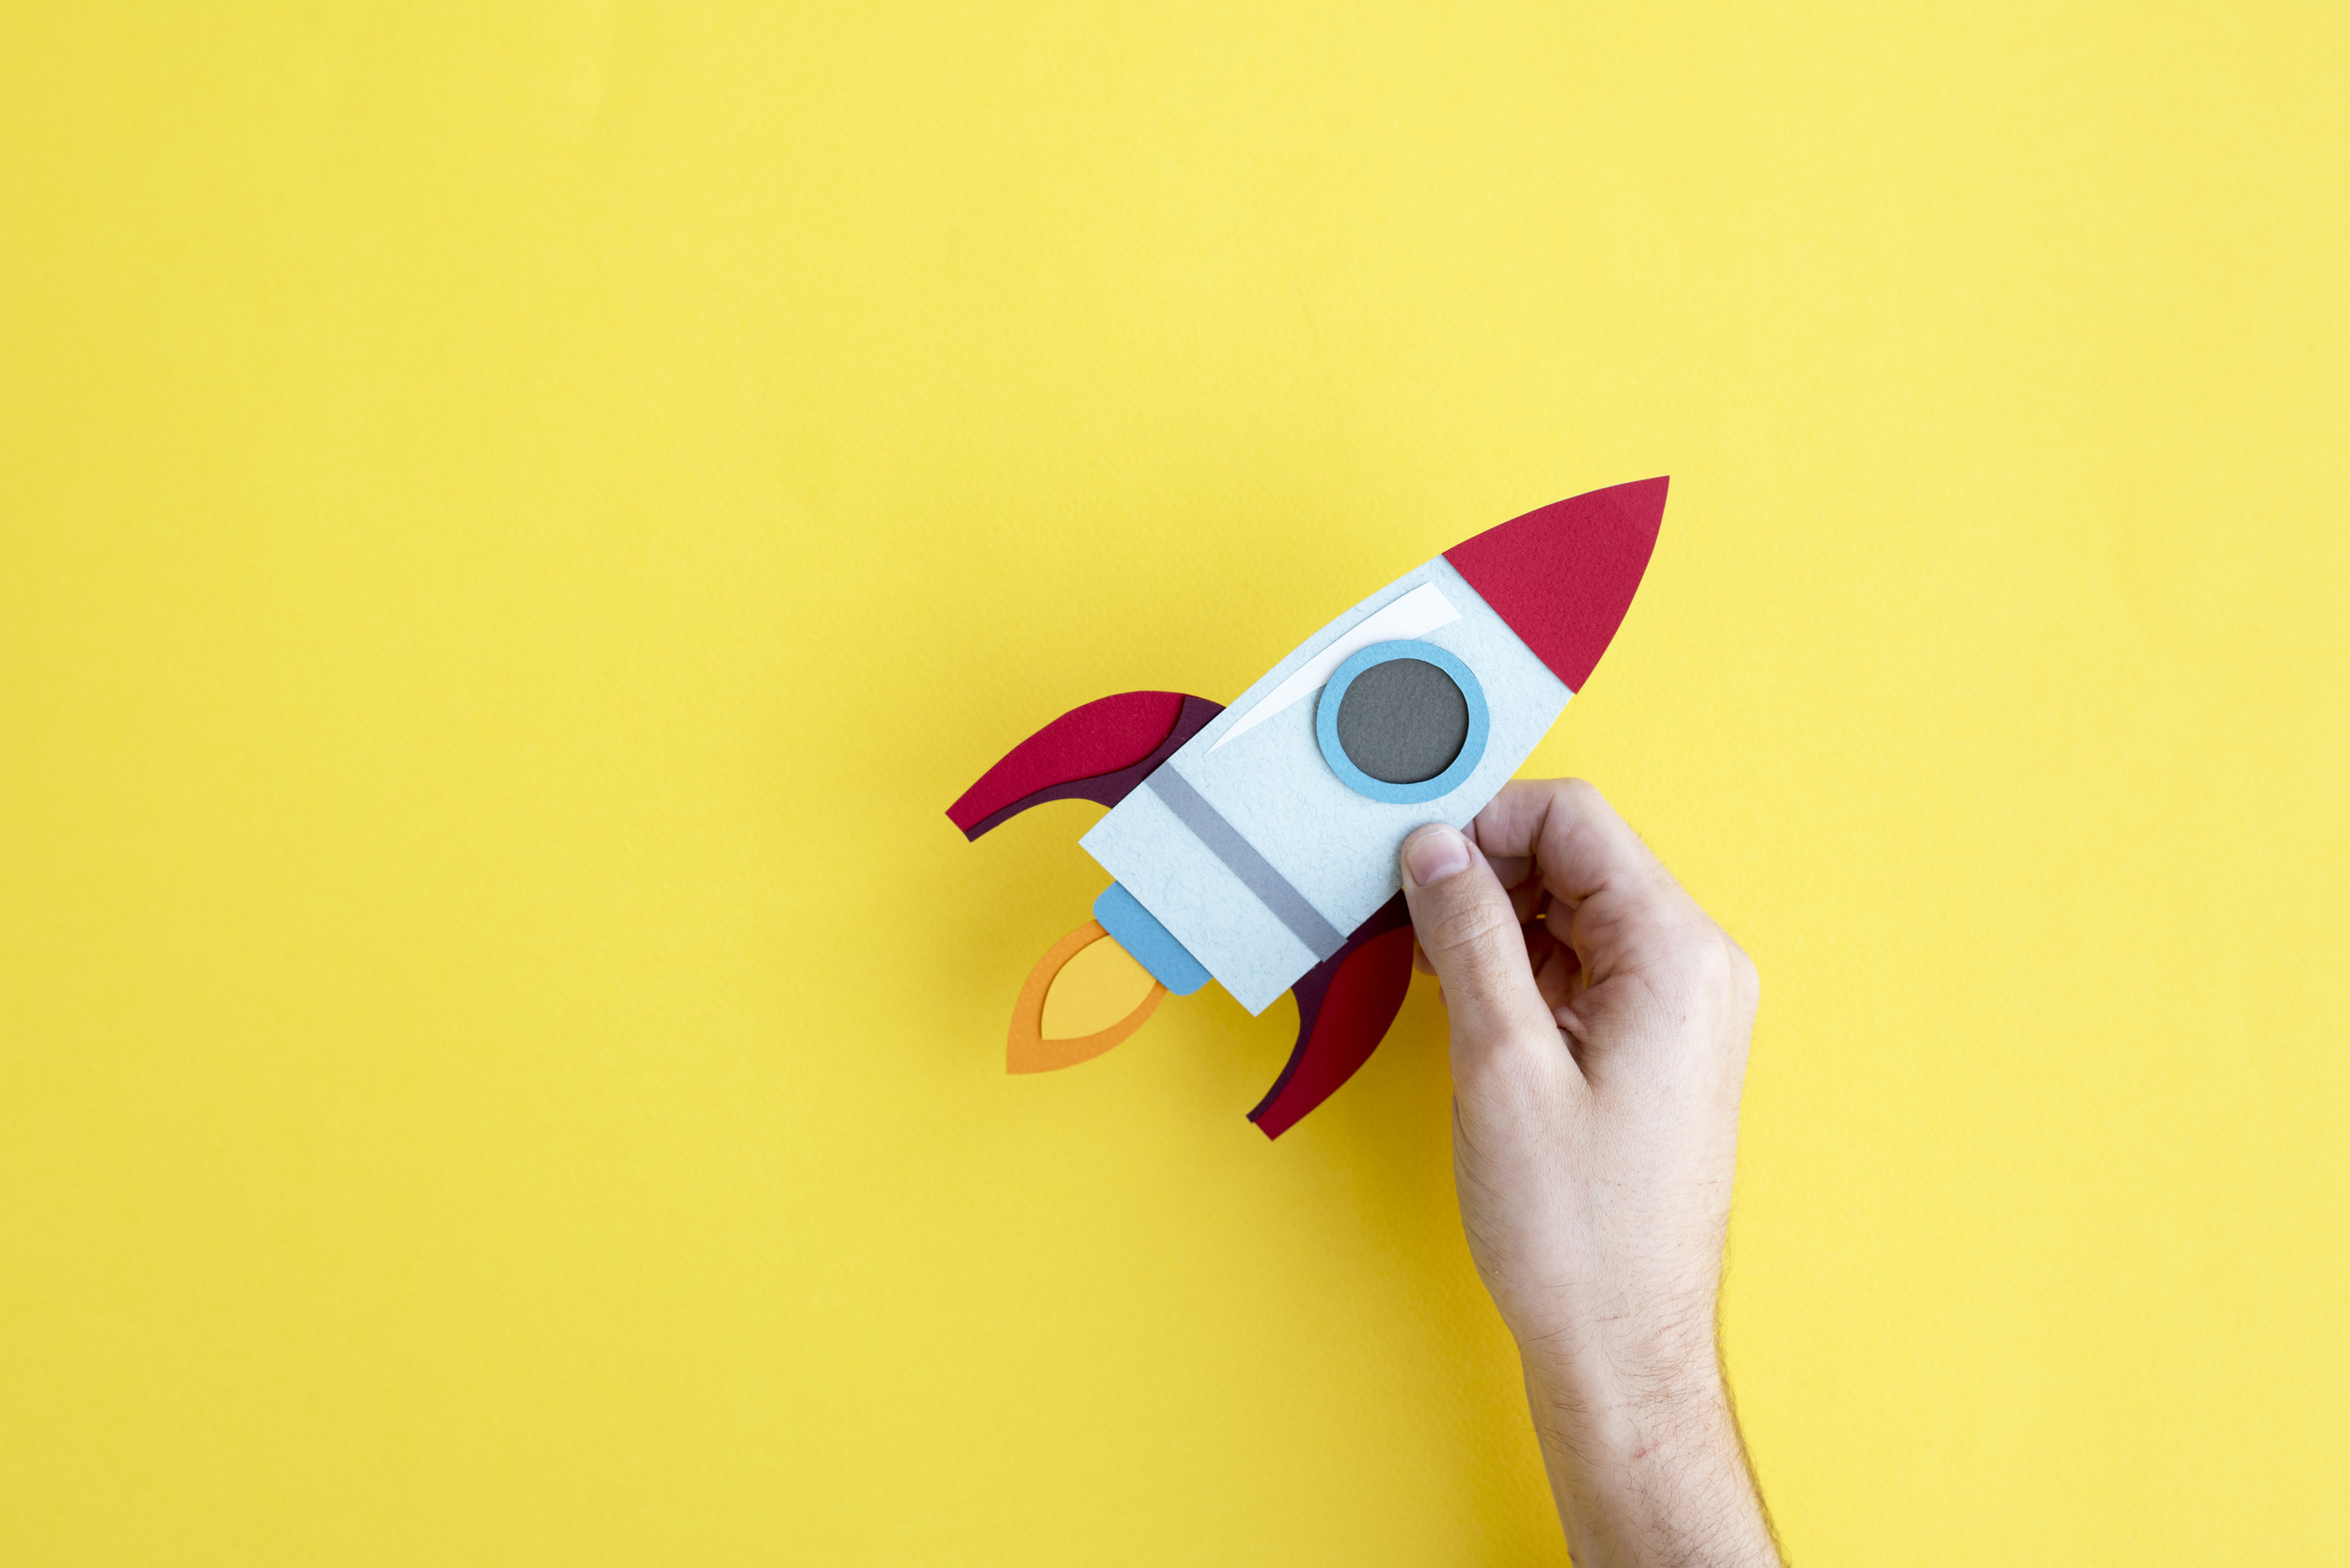 hand-holding-rocket-spaceship-on-yellow-PFKQACP.jpg